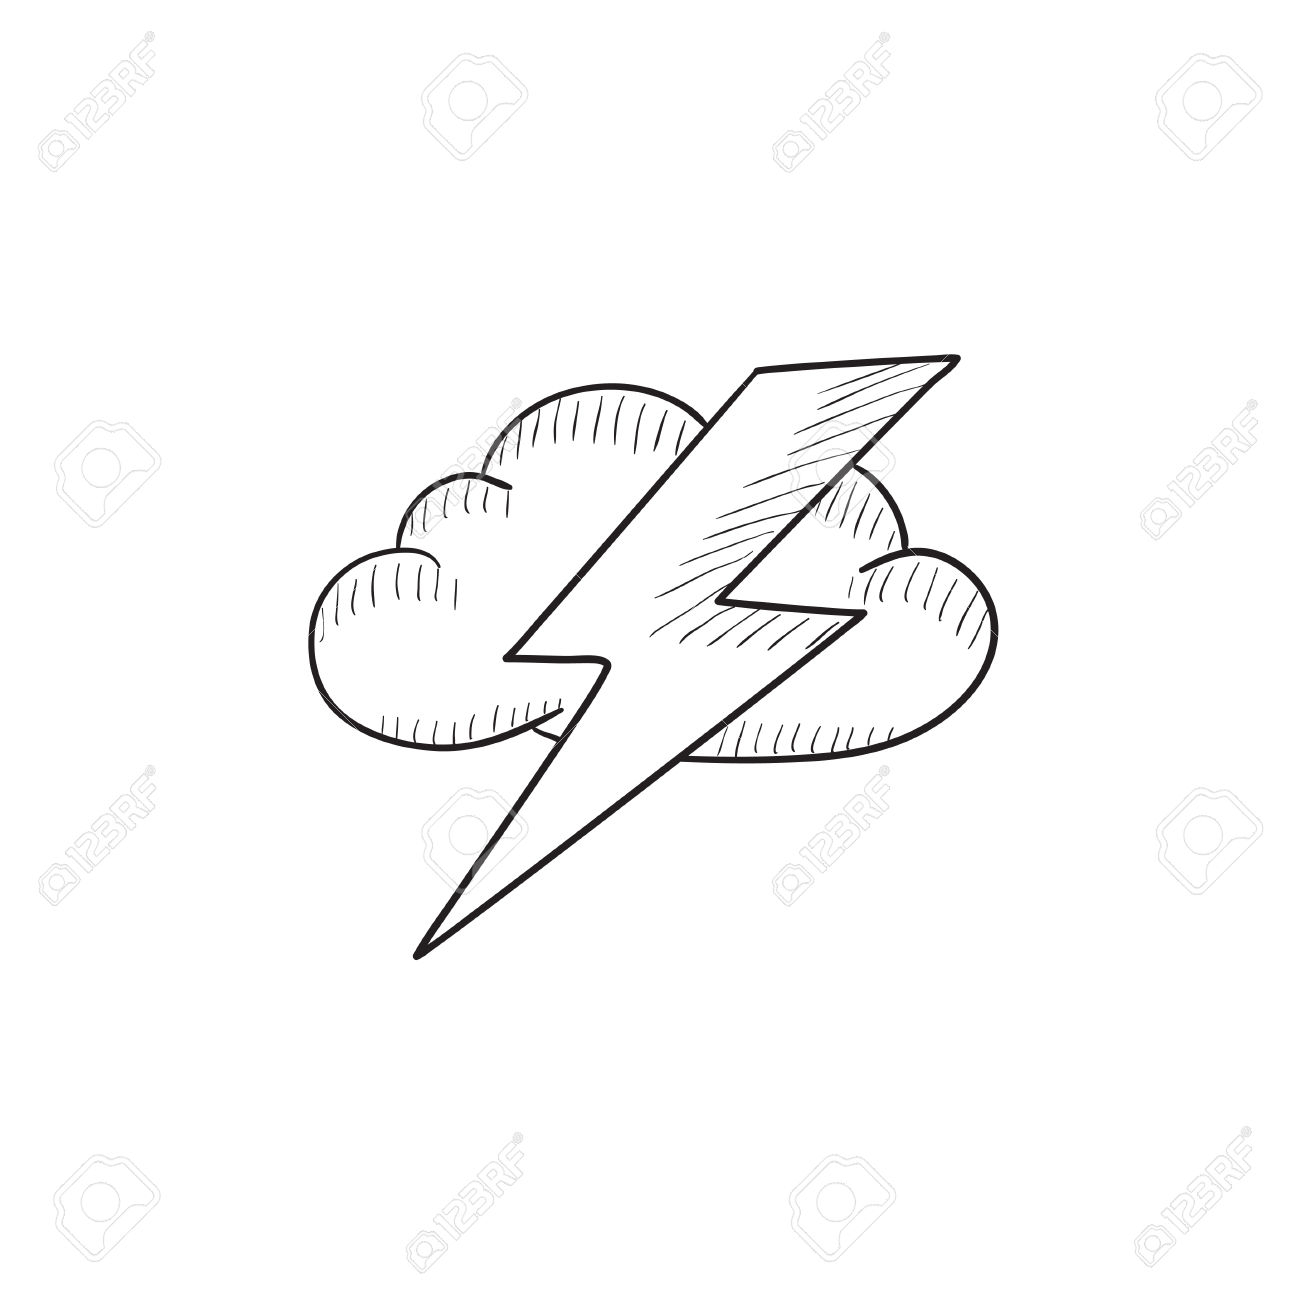 1300x1300 Drawing A Lightning Bolt